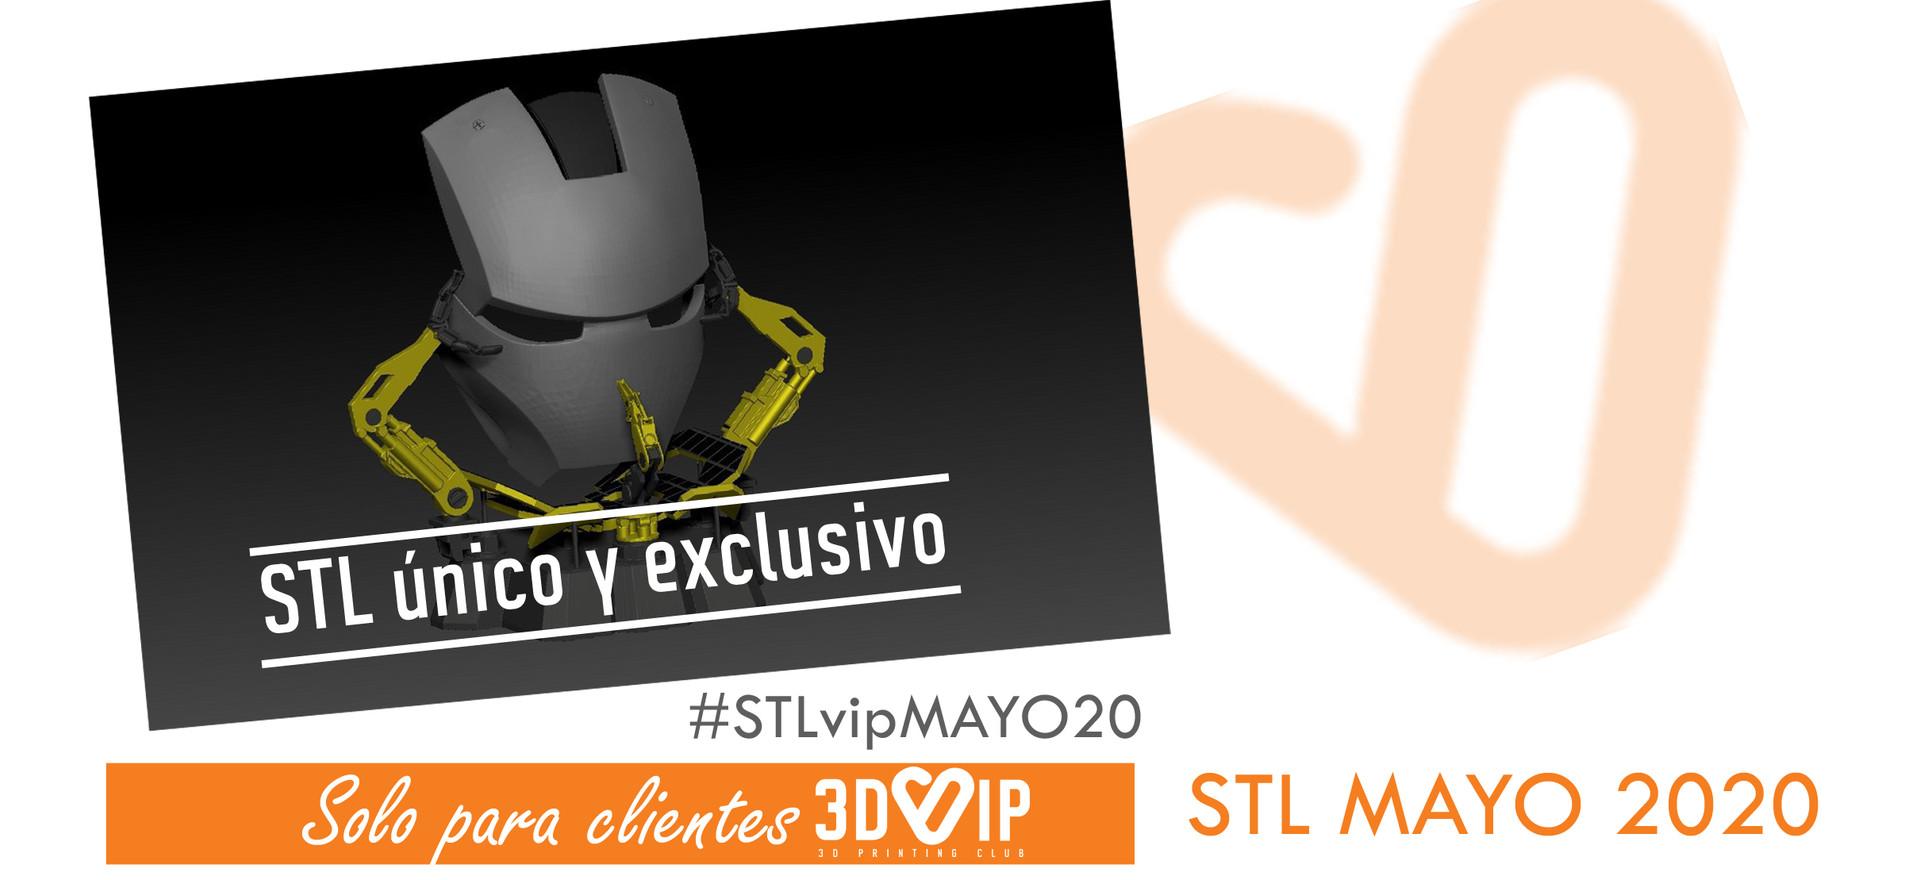 STL MAYO 2020